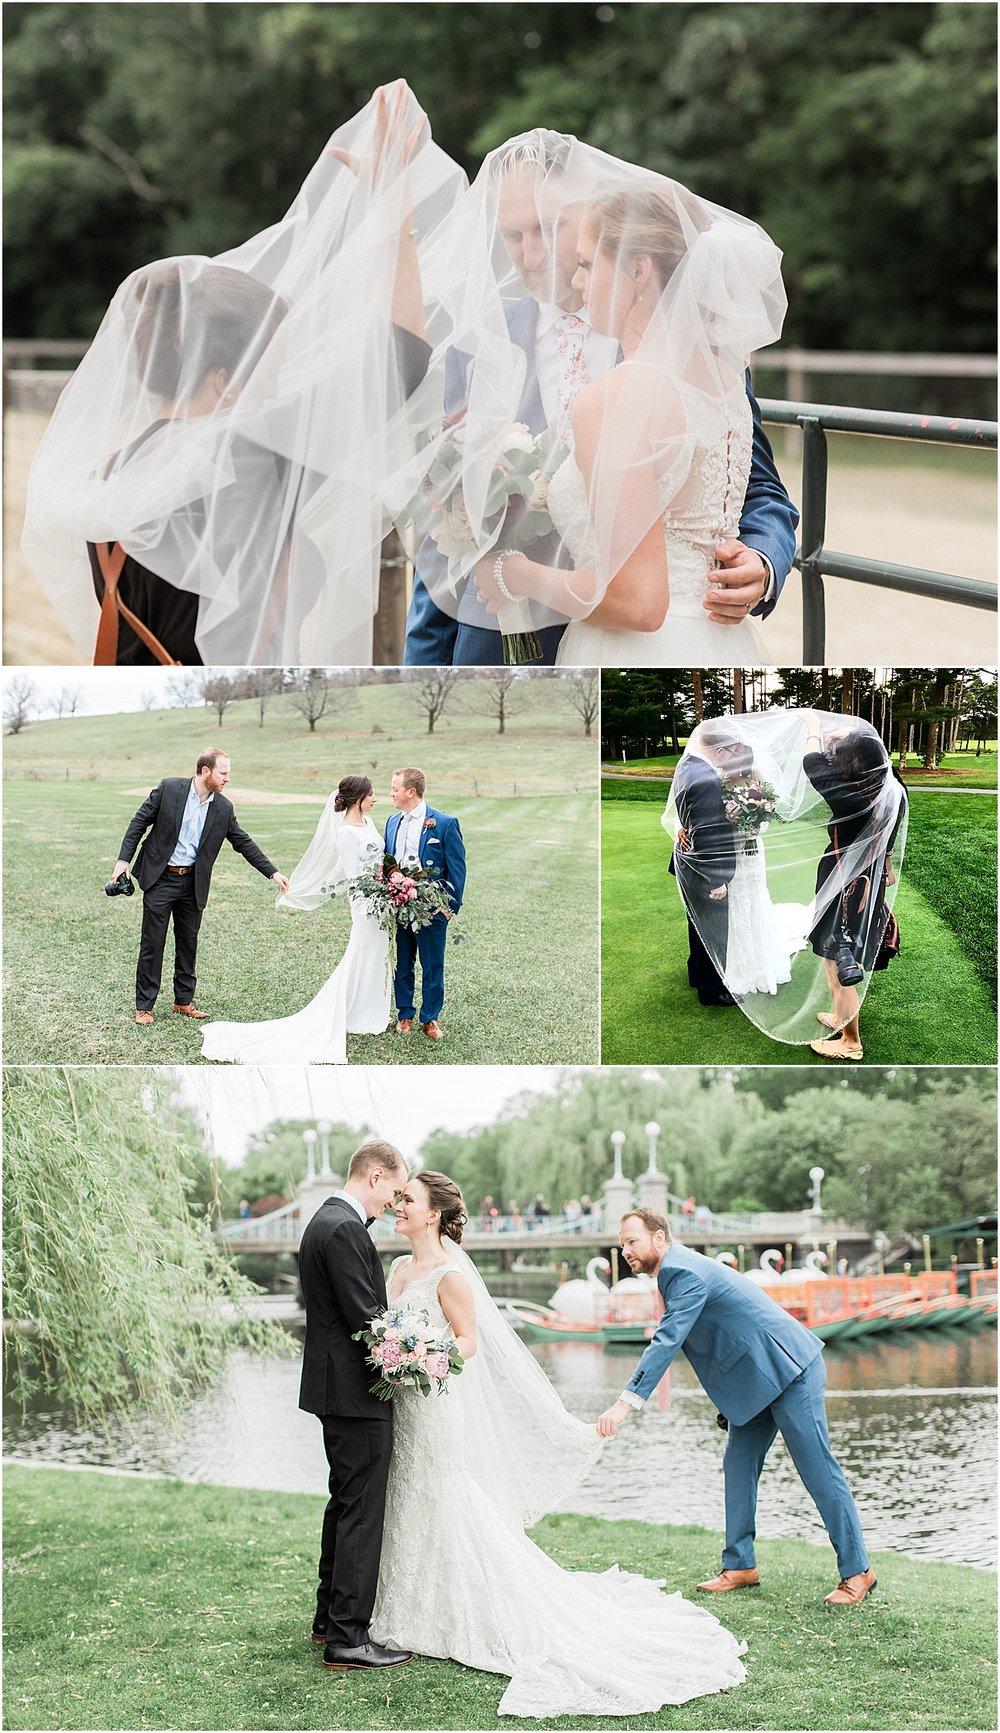 bloopers_2018_cape_cod_boston_wedding_photographer_meredith_jane_photography_chris_kerr_hunter_photo_1843.jpg